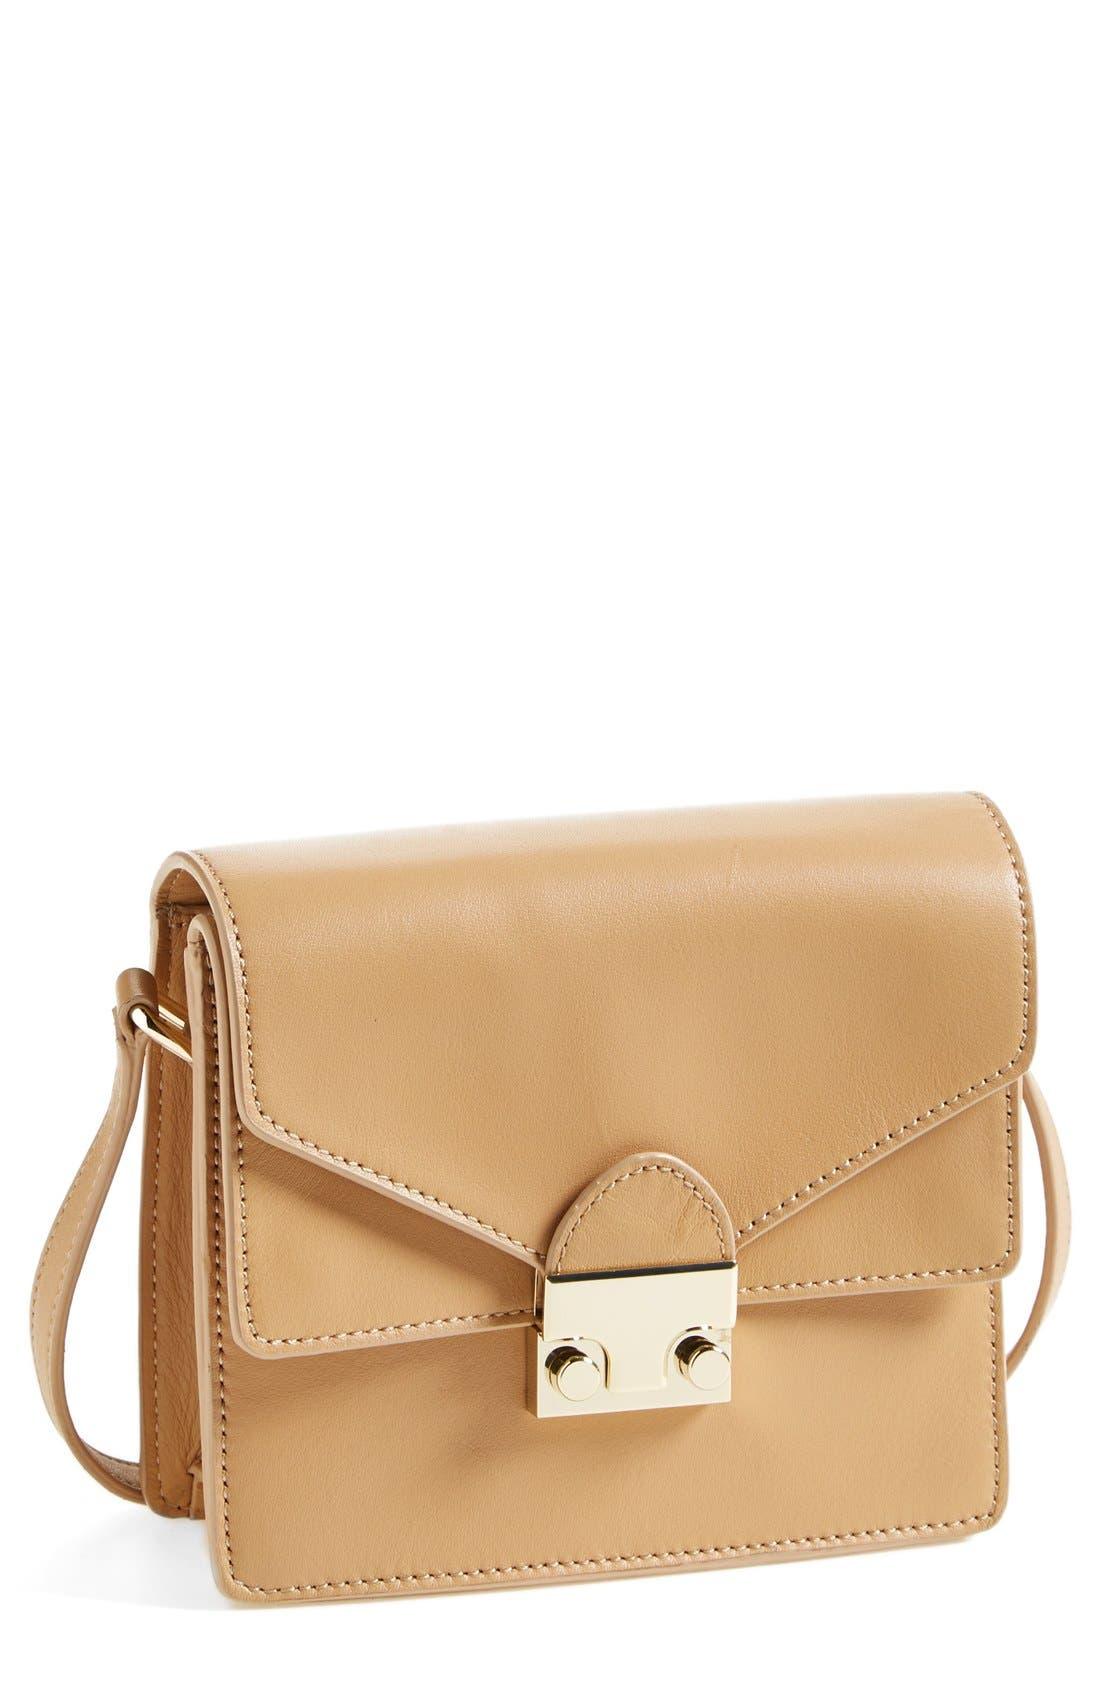 Alternate Image 1 Selected - Loeffler Randall 'Mini Agenda' Crossbody Bag